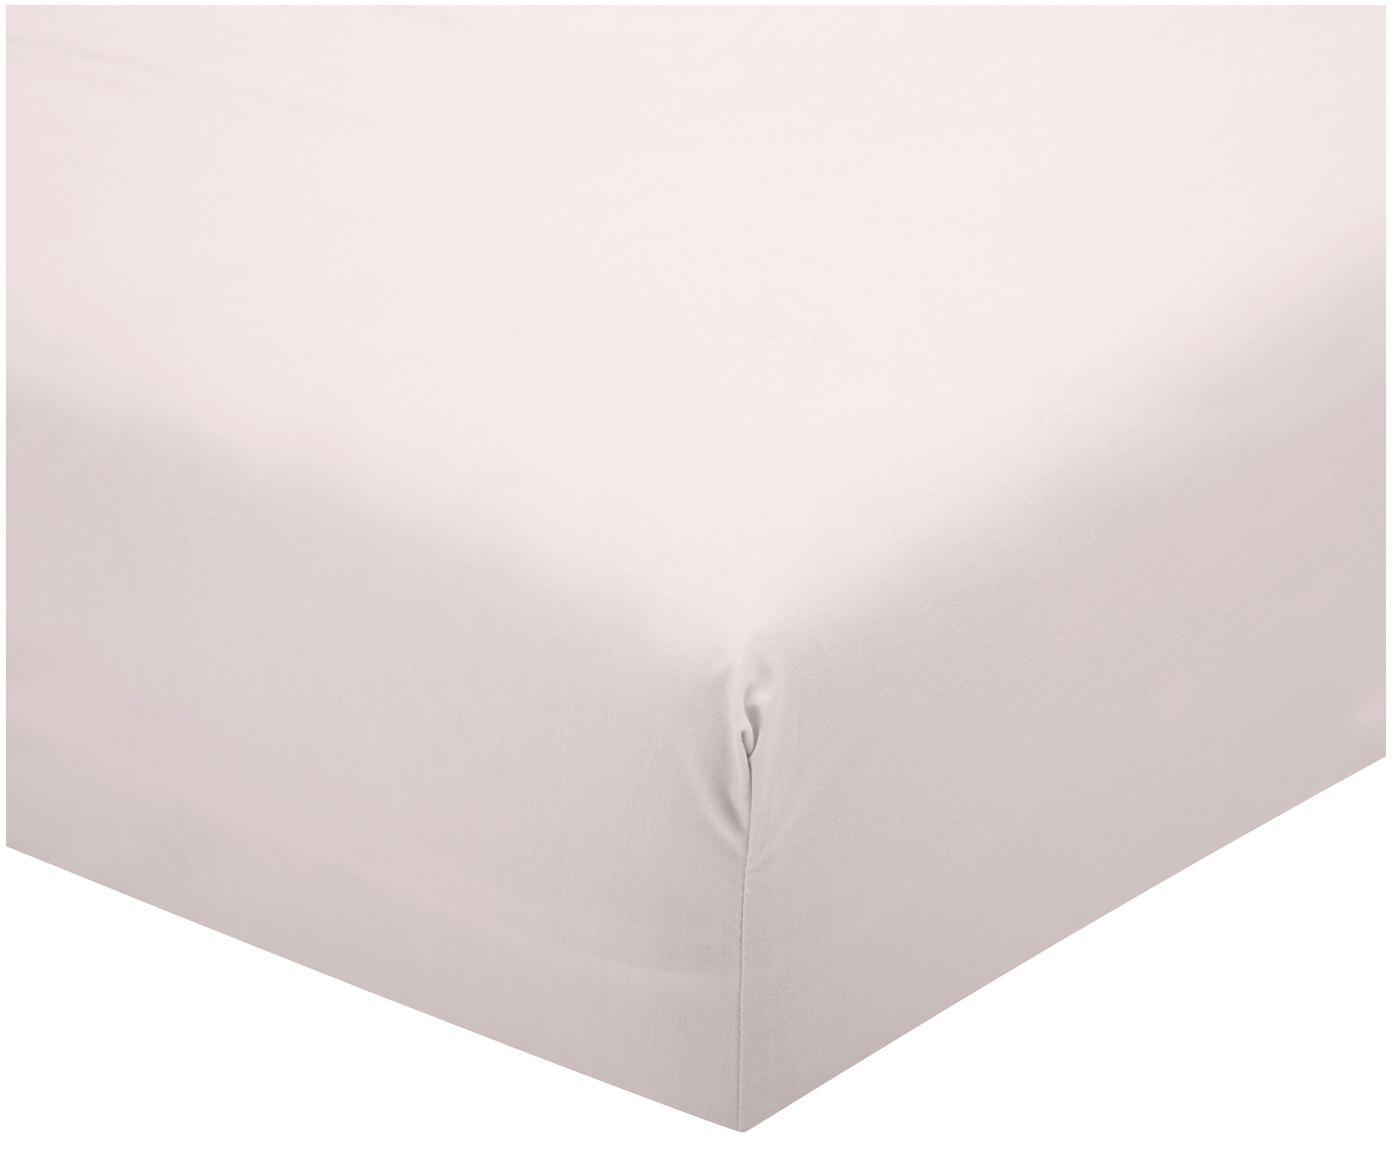 Perkal hoeslaken Elsie, Weeftechniek: perkal, Roze, 90 x 200 cm